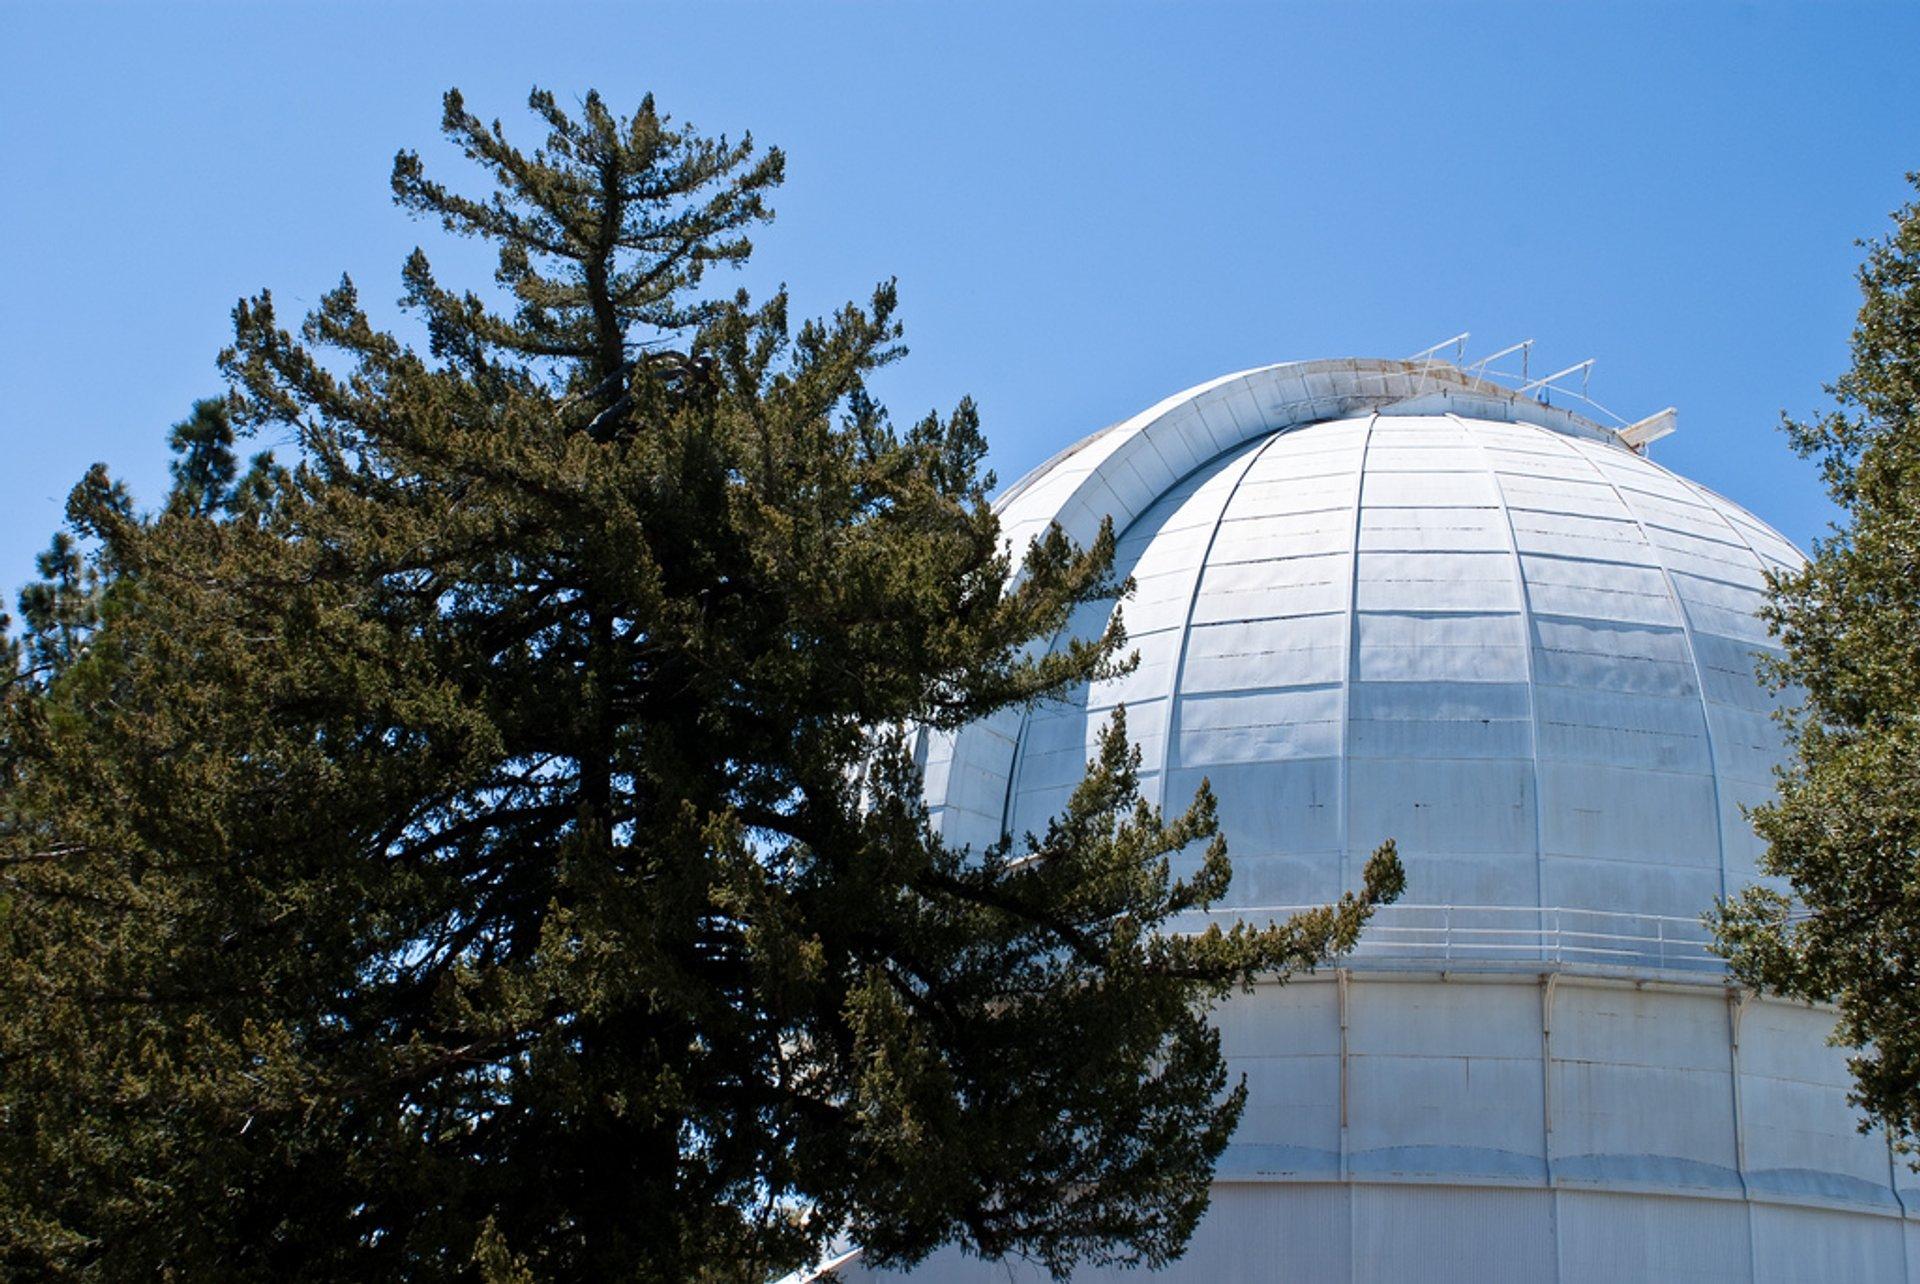 Mount Wilson Observatory in Los Angeles 2019 - Best Time